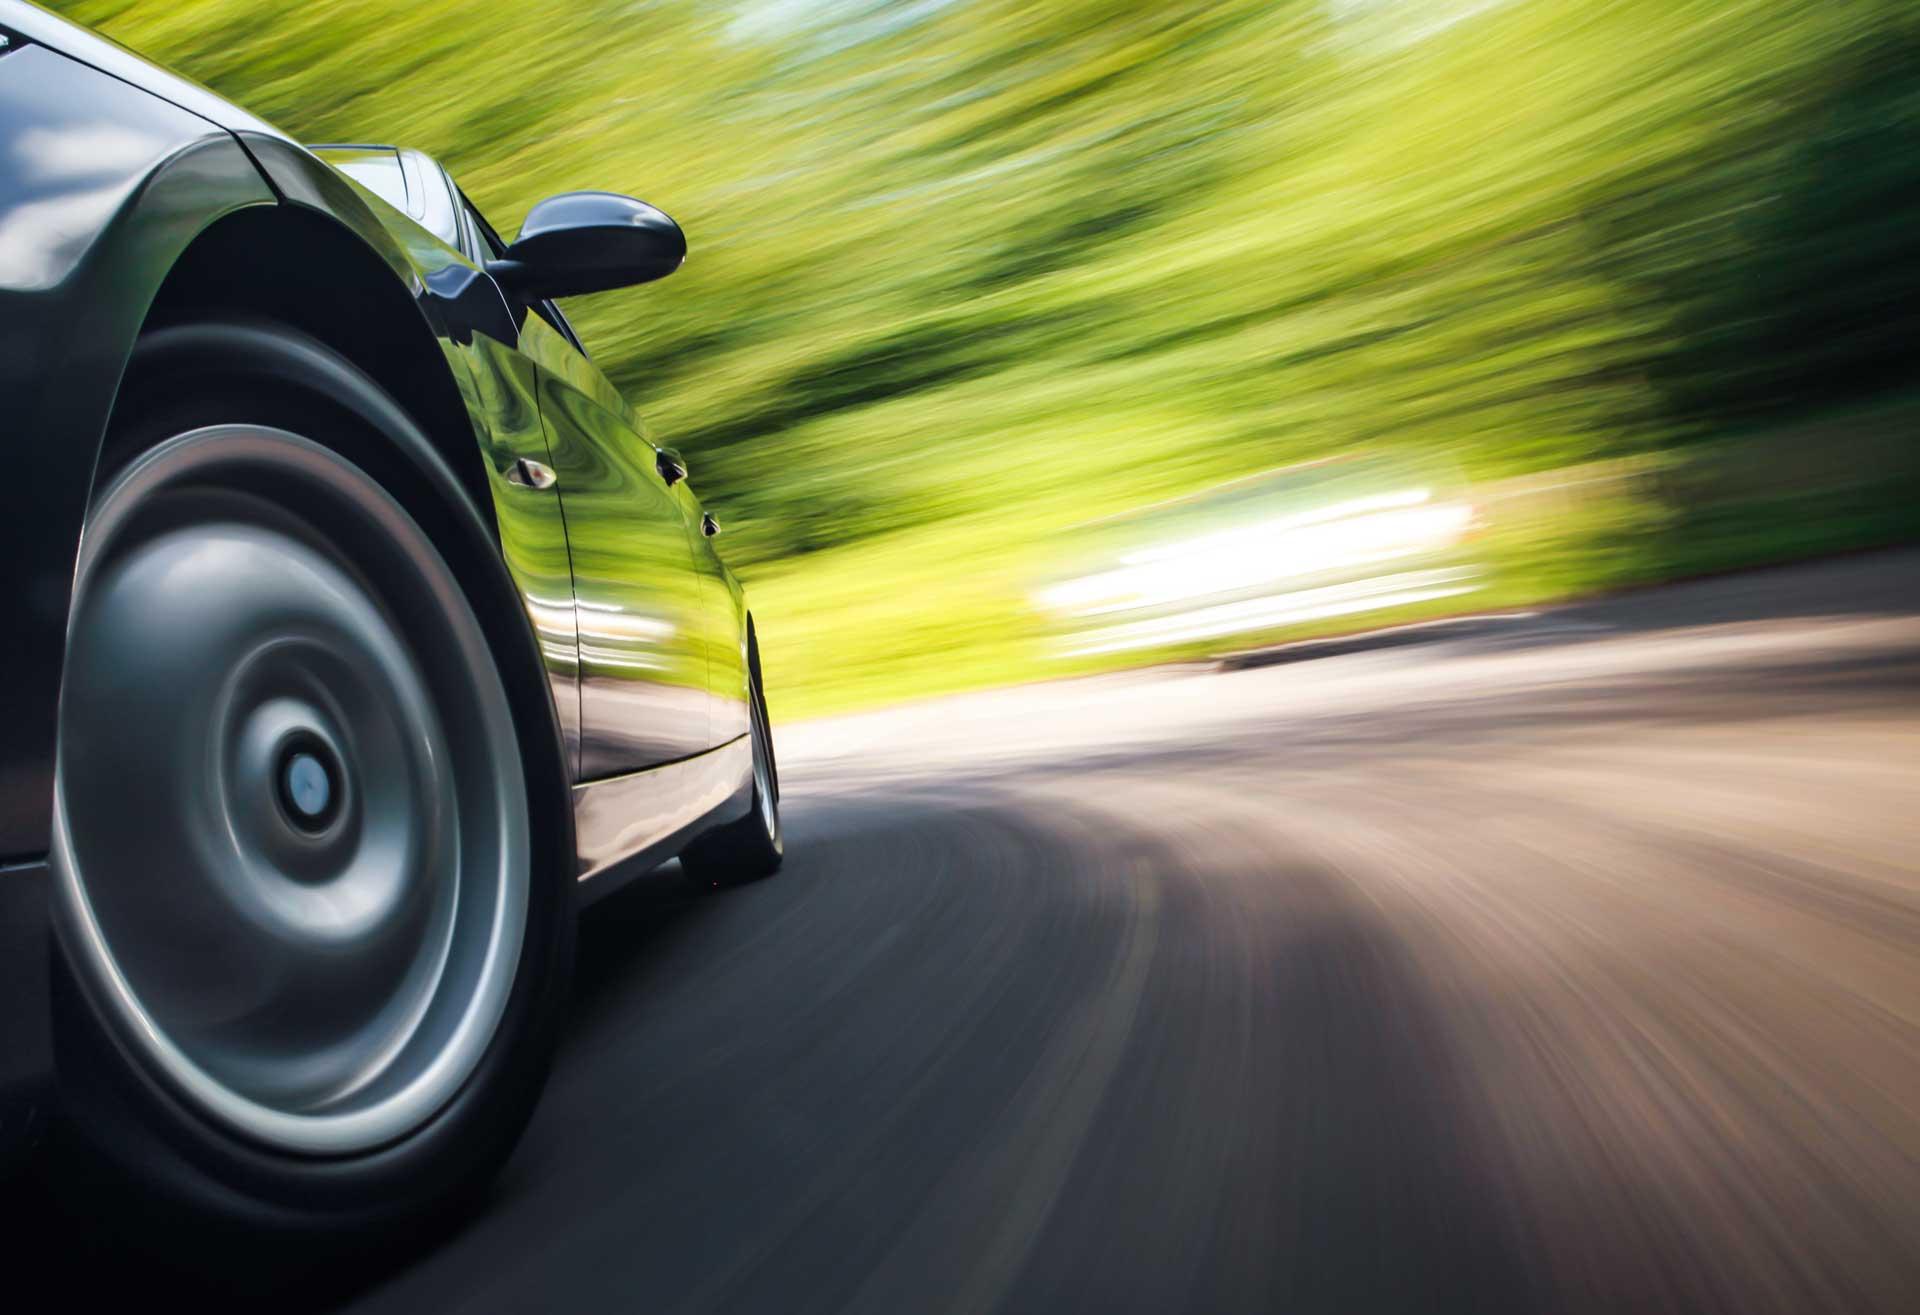 「Driving fast」の画像検索結果